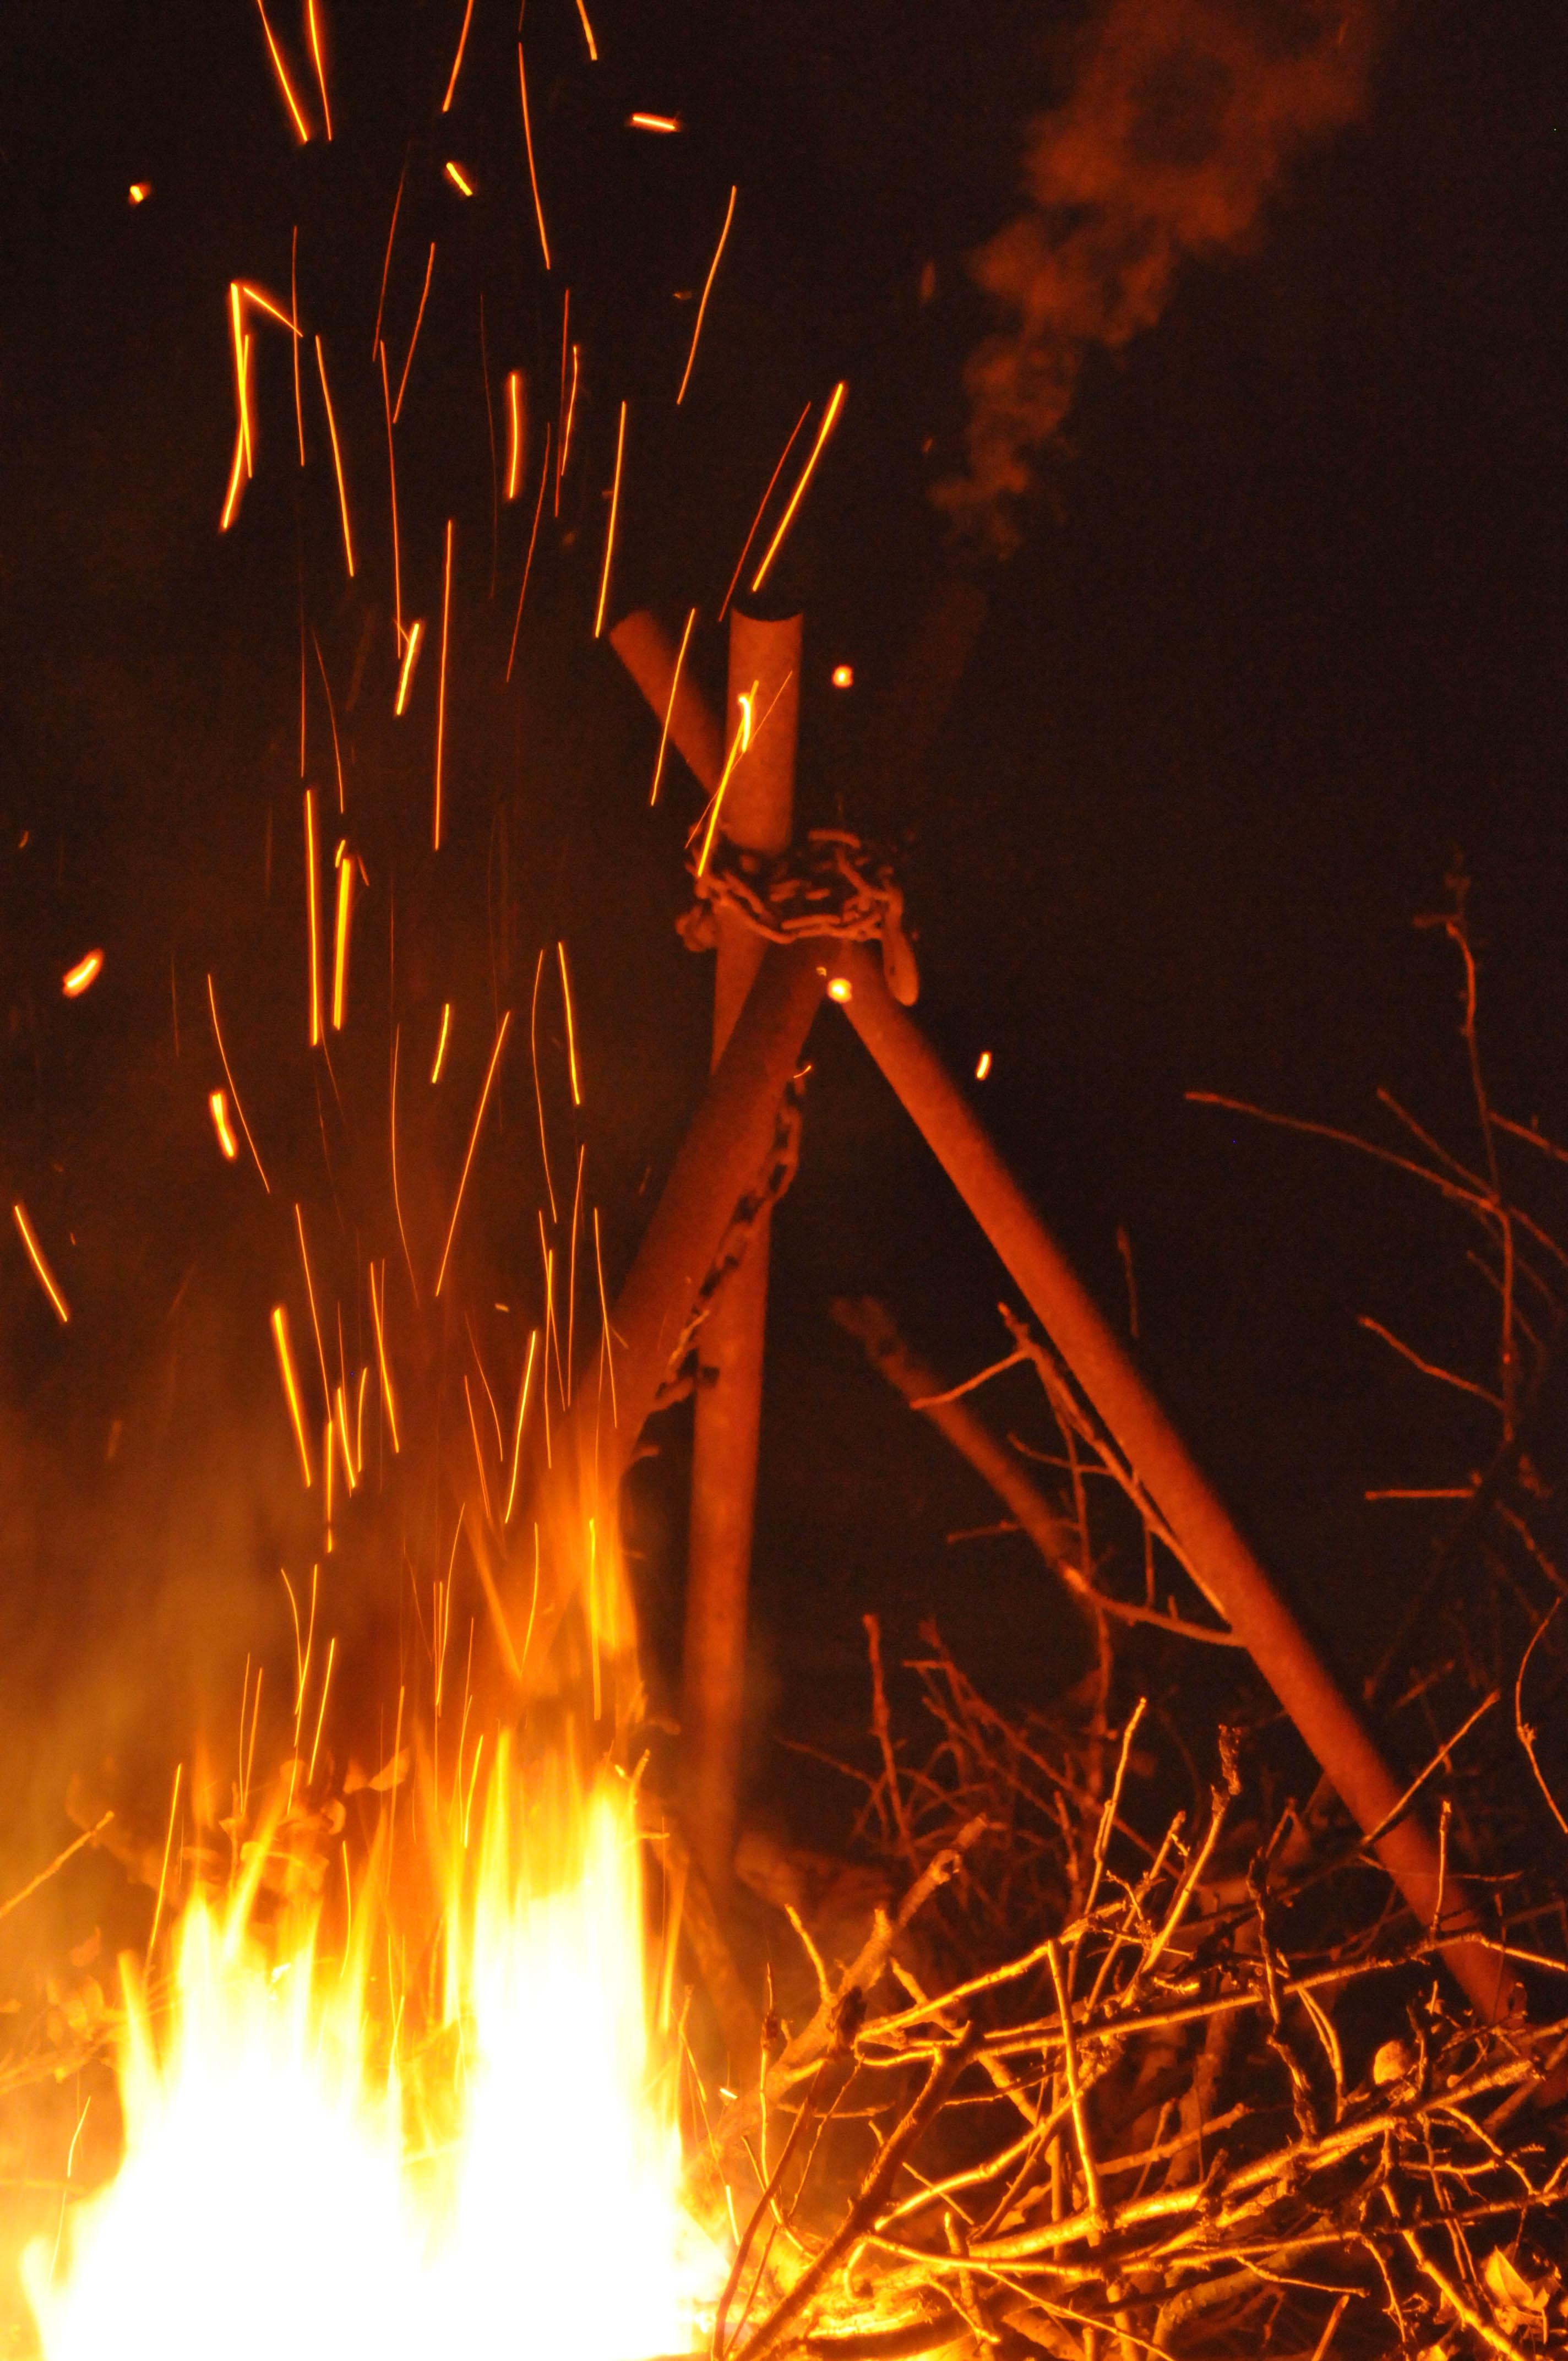 https://i0.wp.com/upload.wikimedia.org/wikipedia/commons/a/ac/Christmas_bonfire.jpg